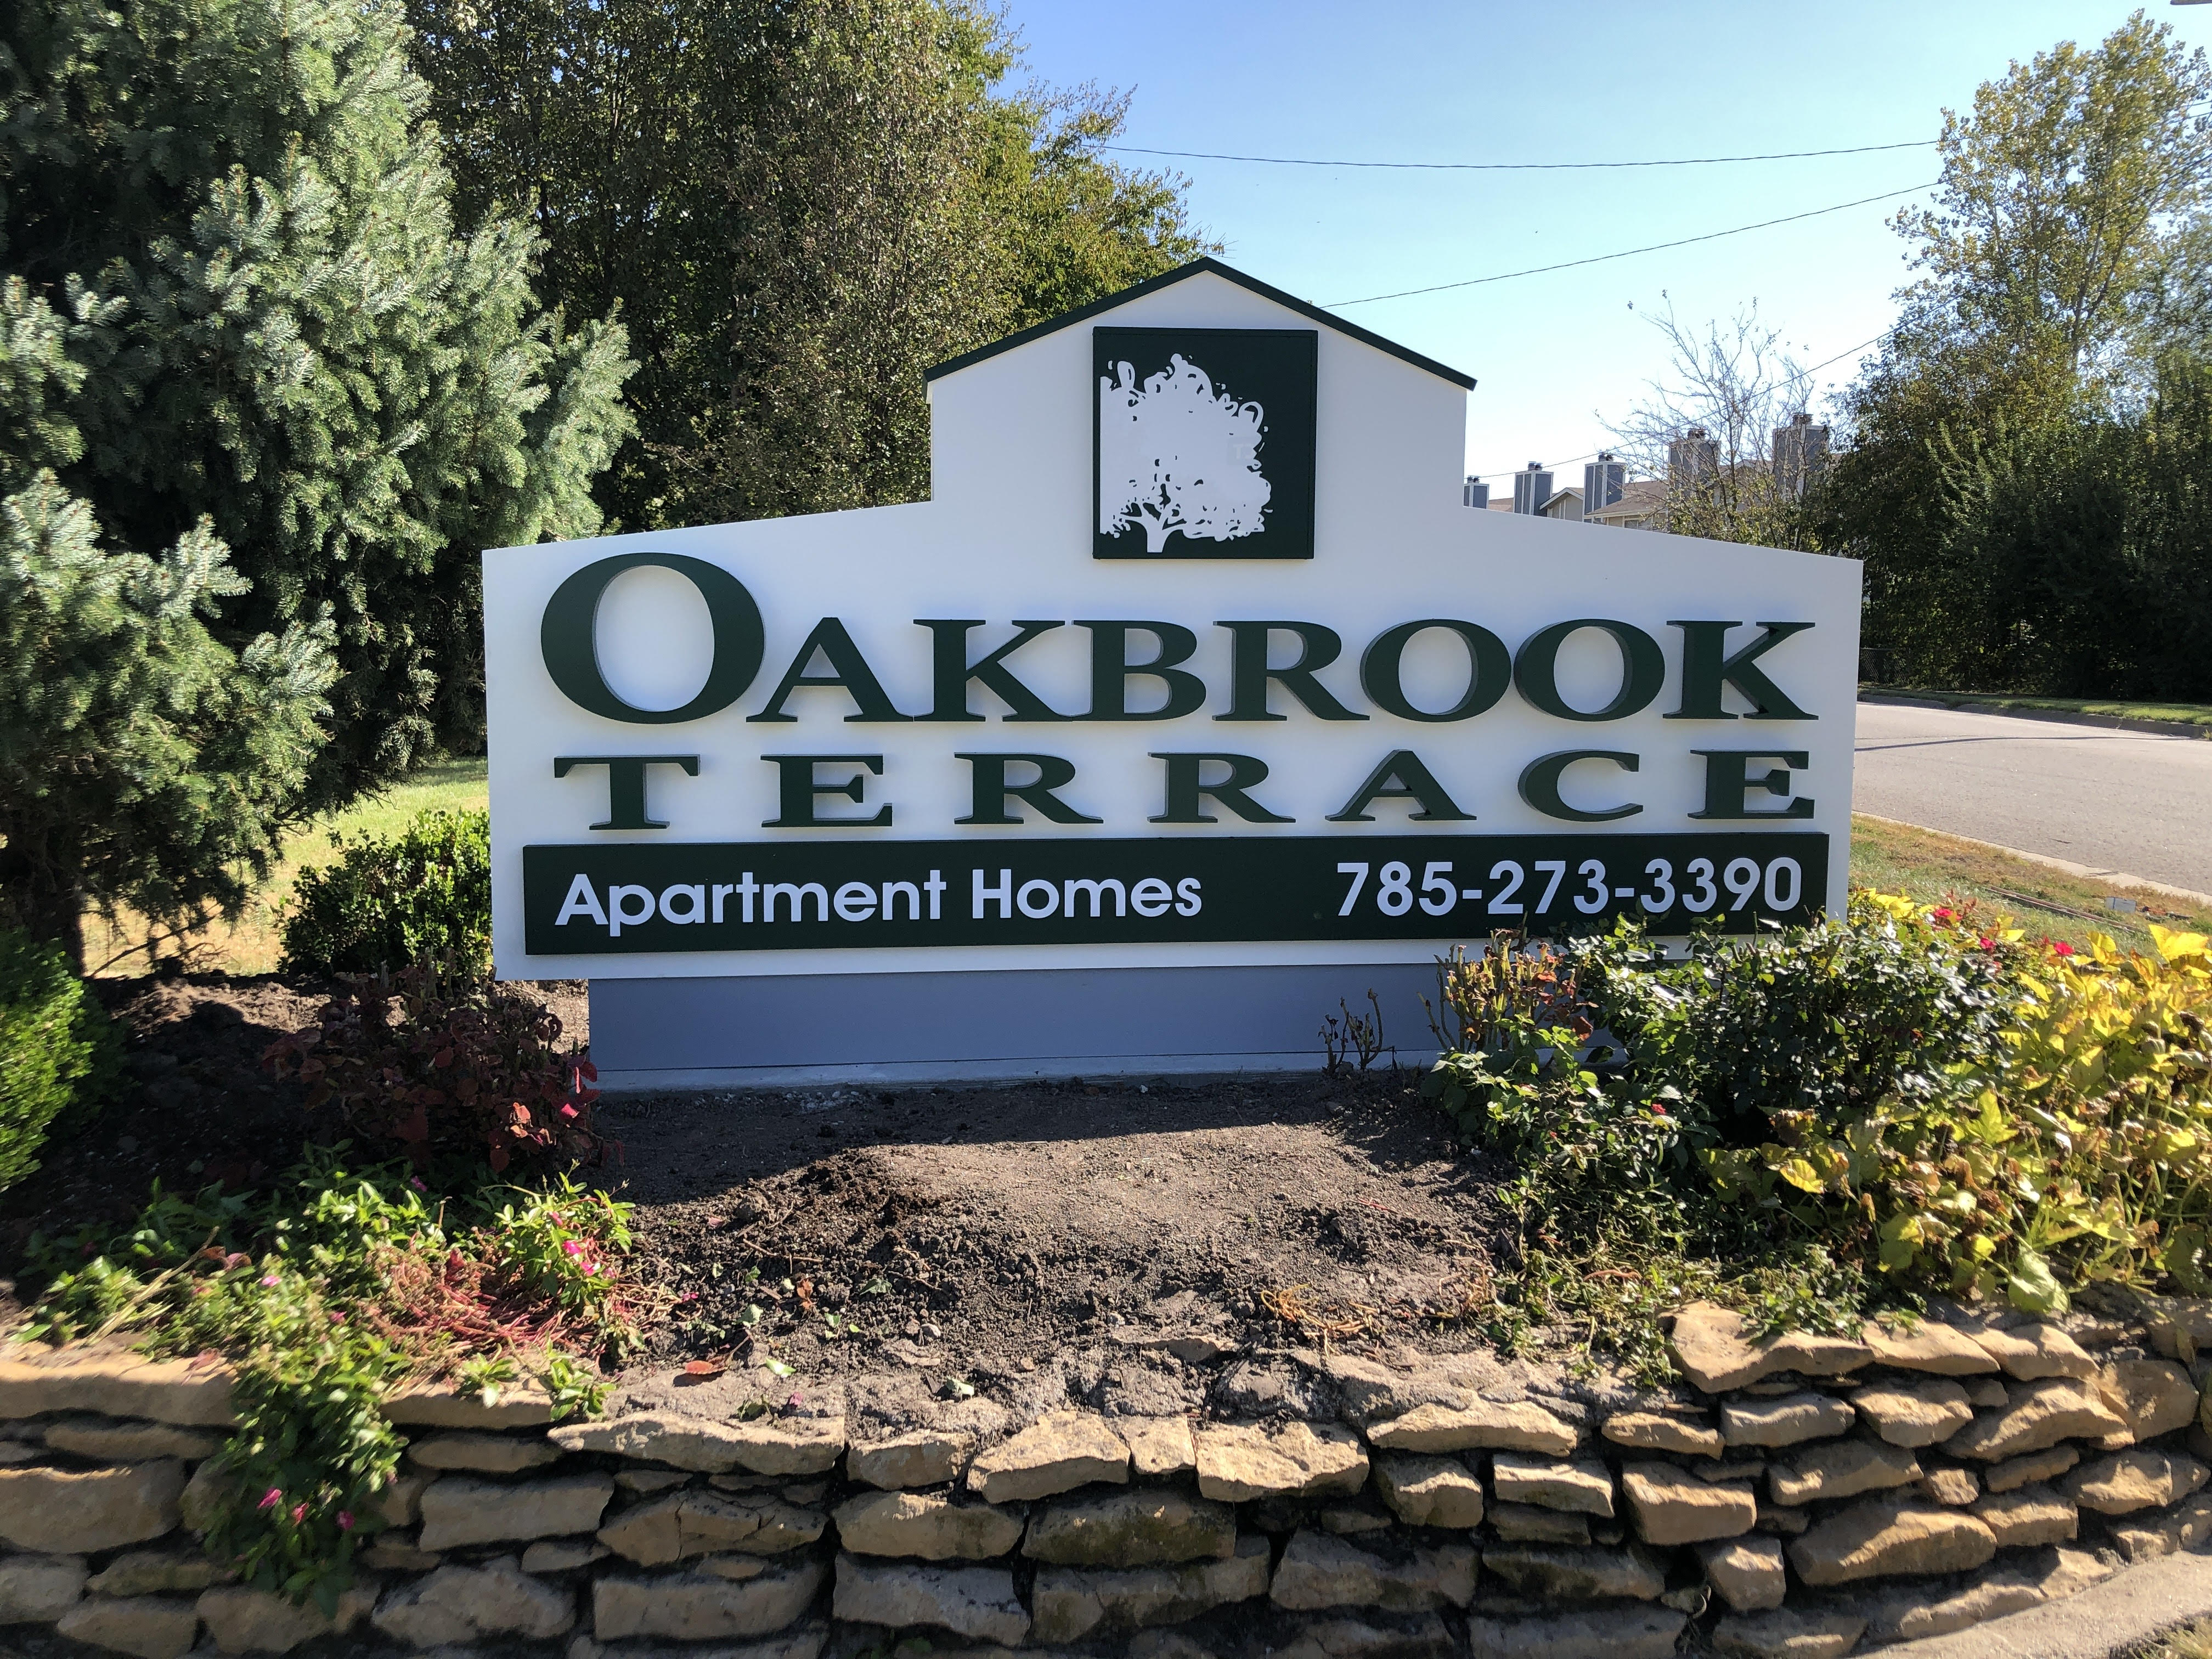 Oakbrook Terrace Apartments